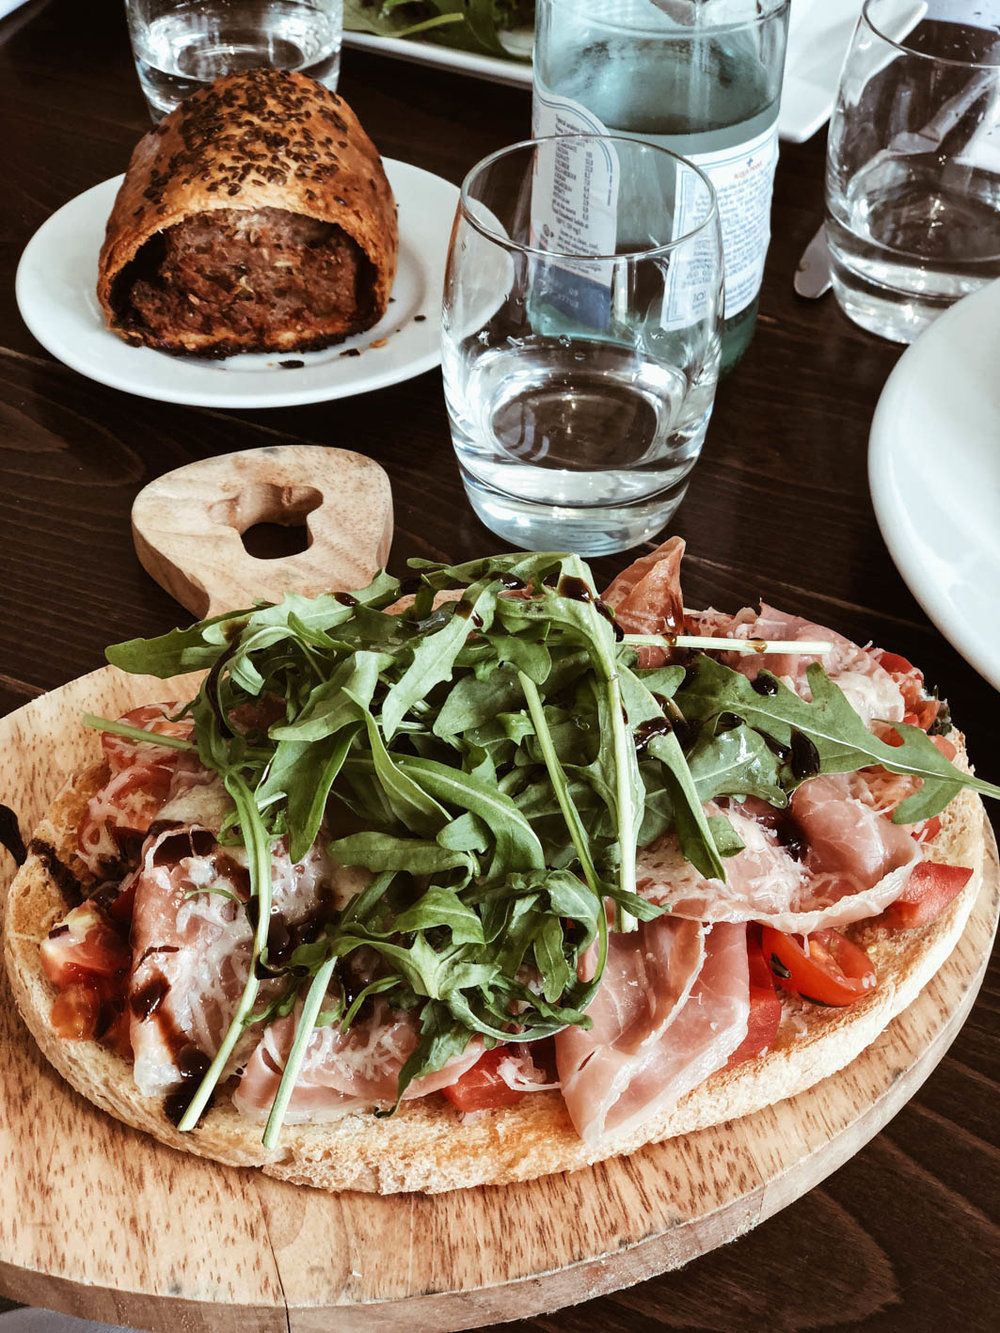 Carnet Sauvage - Blog mode voyages Ecosse , travel tips, food...